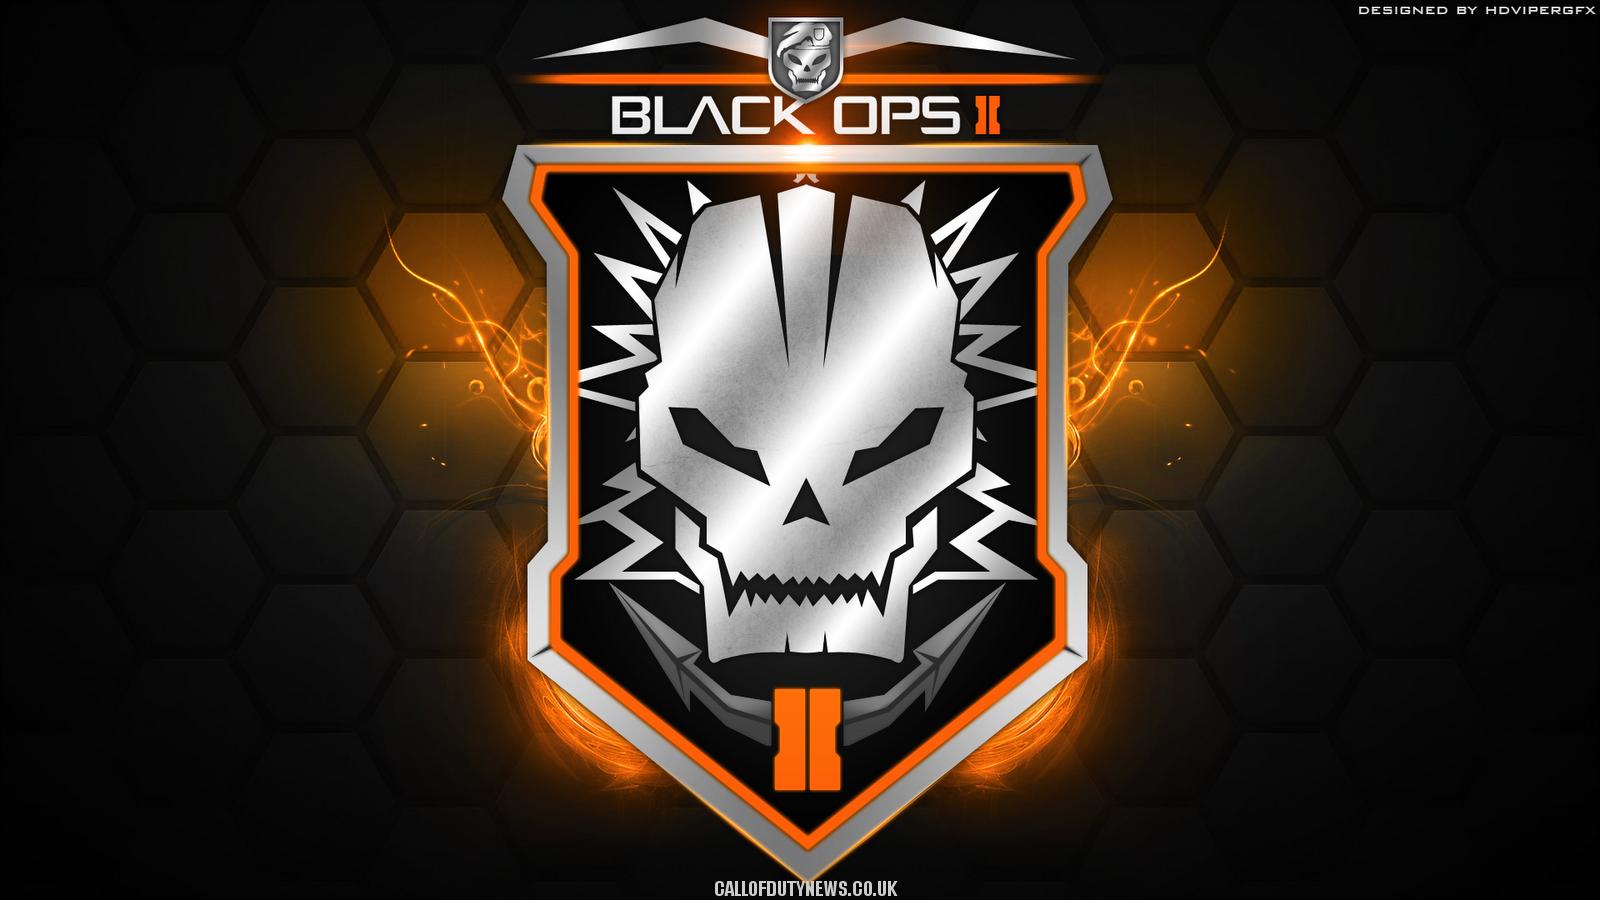 wallpaper: Black Ops 2 Full Hd Wallpapers